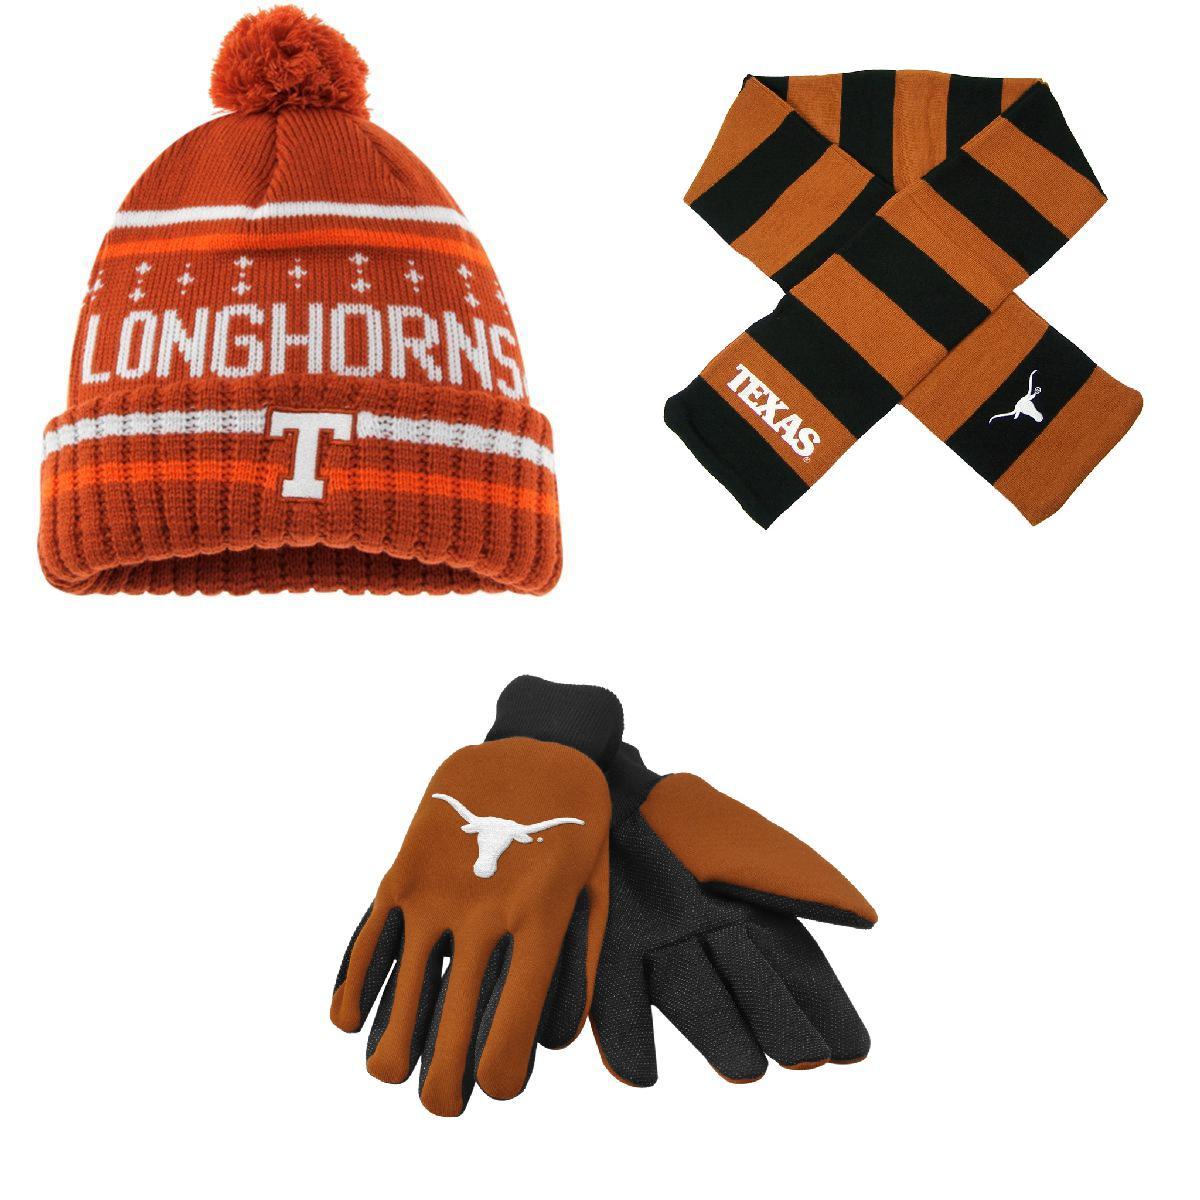 NCAA Texas Longhorns Grip Work Glove Barometer Beanie Hat And Striped Rugby Scarf 3 Pack Bundle